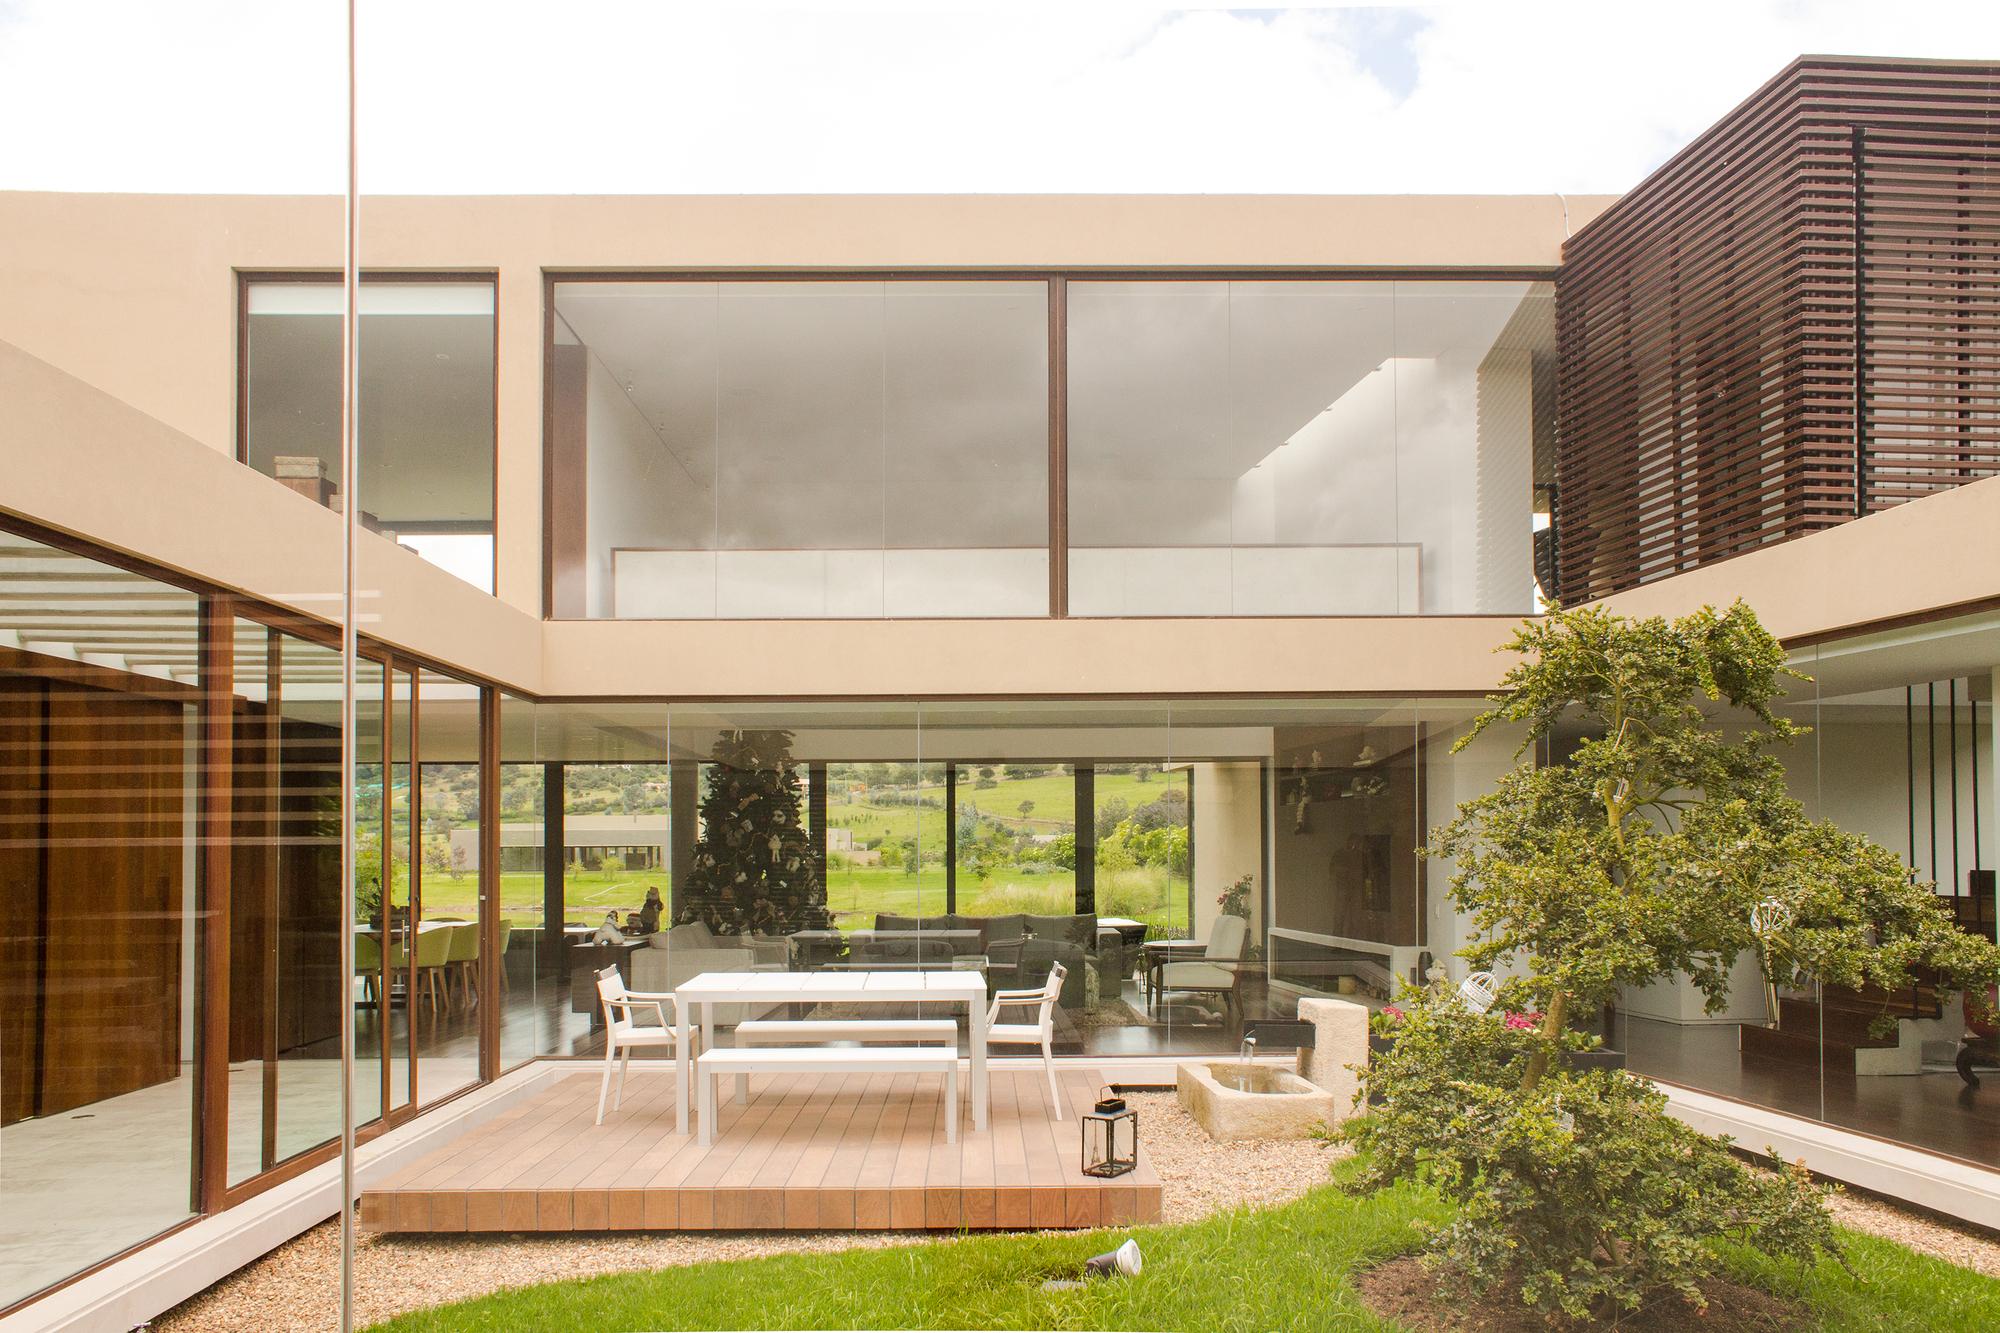 Gallery of casa 5 arquitectura en estudio 3 for Casa estudio arquitectura